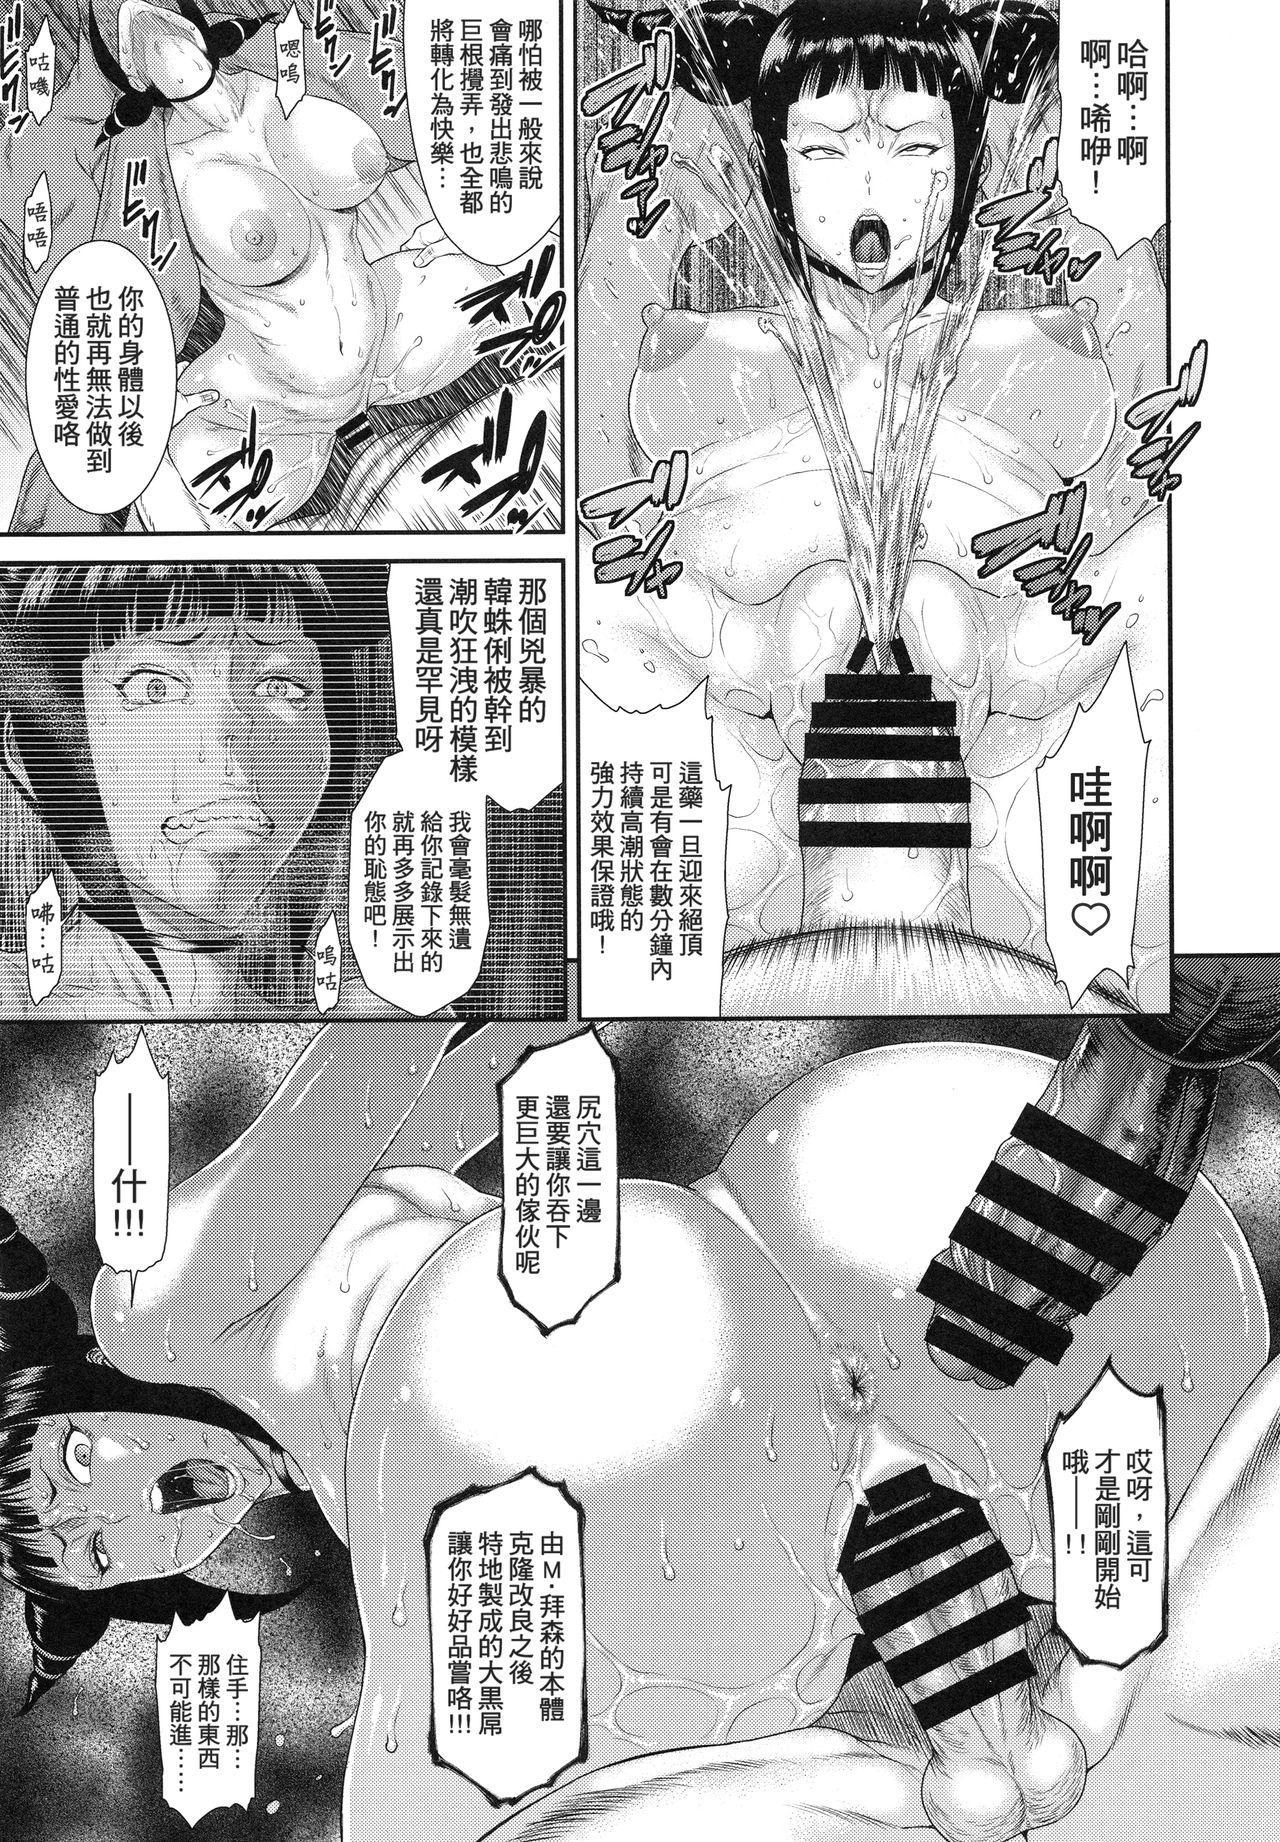 Jaaku - Wicked 12